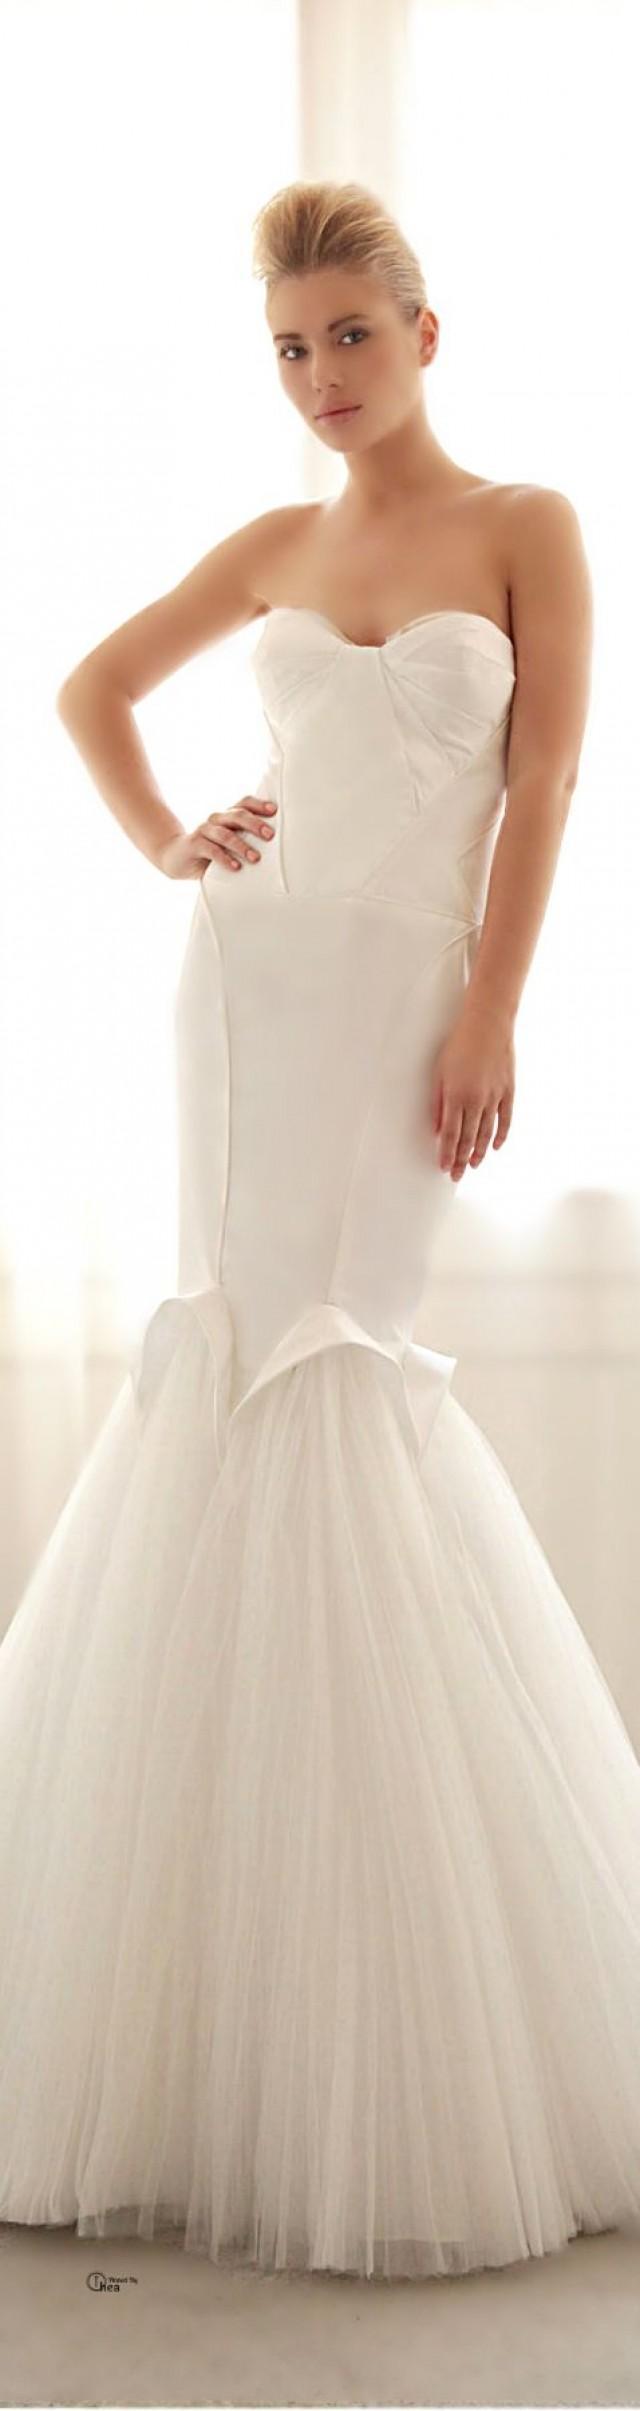 Turmec » non strapless wedding dresses pinterest